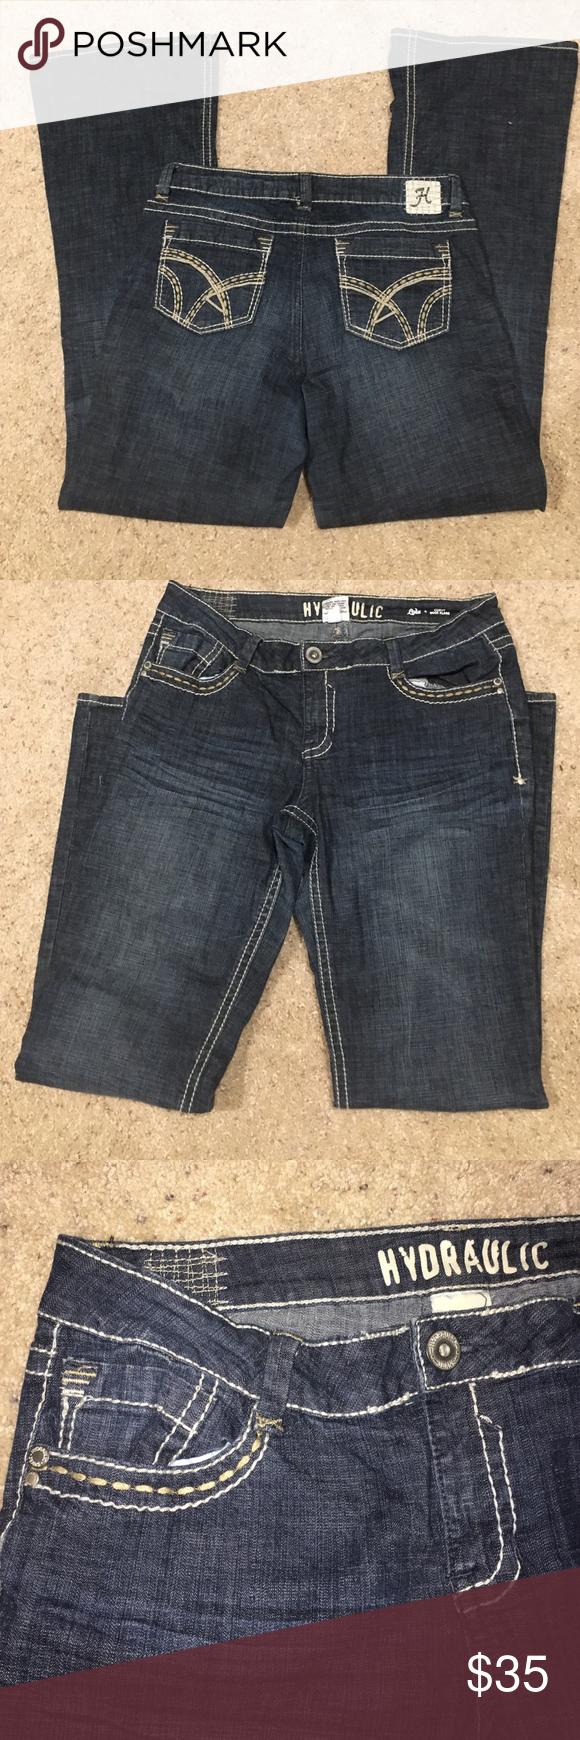 1b3fa3be32d Hydraulic Lola jeans Brand new hydraulic Lola curvy boot flare jeans size  15 16 Hydraulic